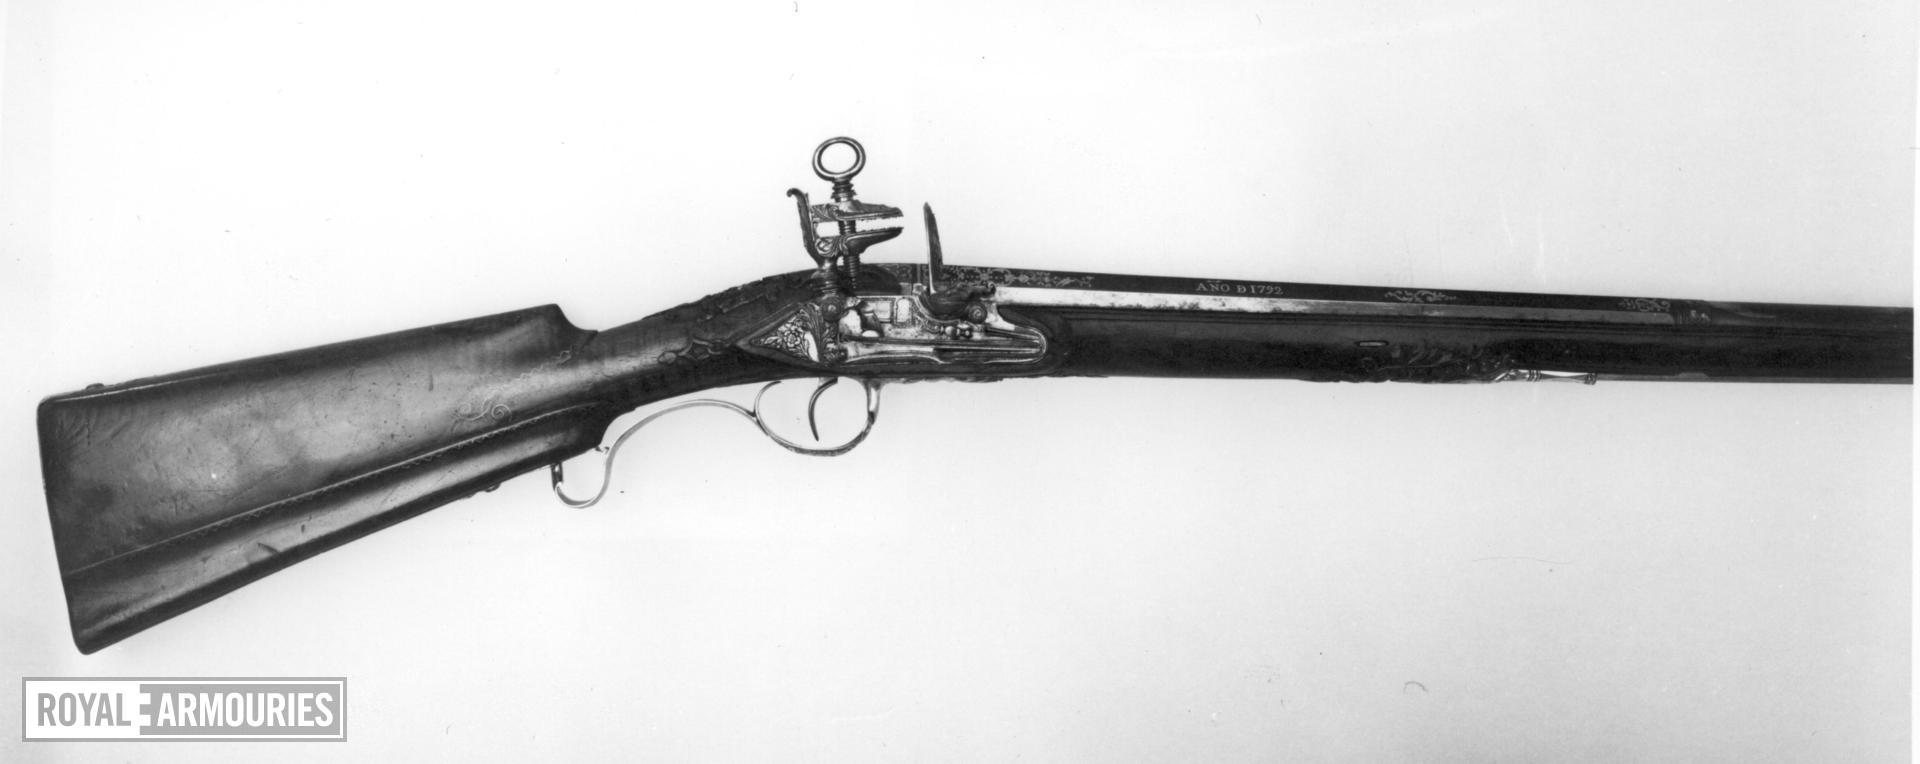 Flintlock gun - By Juan Esteban Bustindui